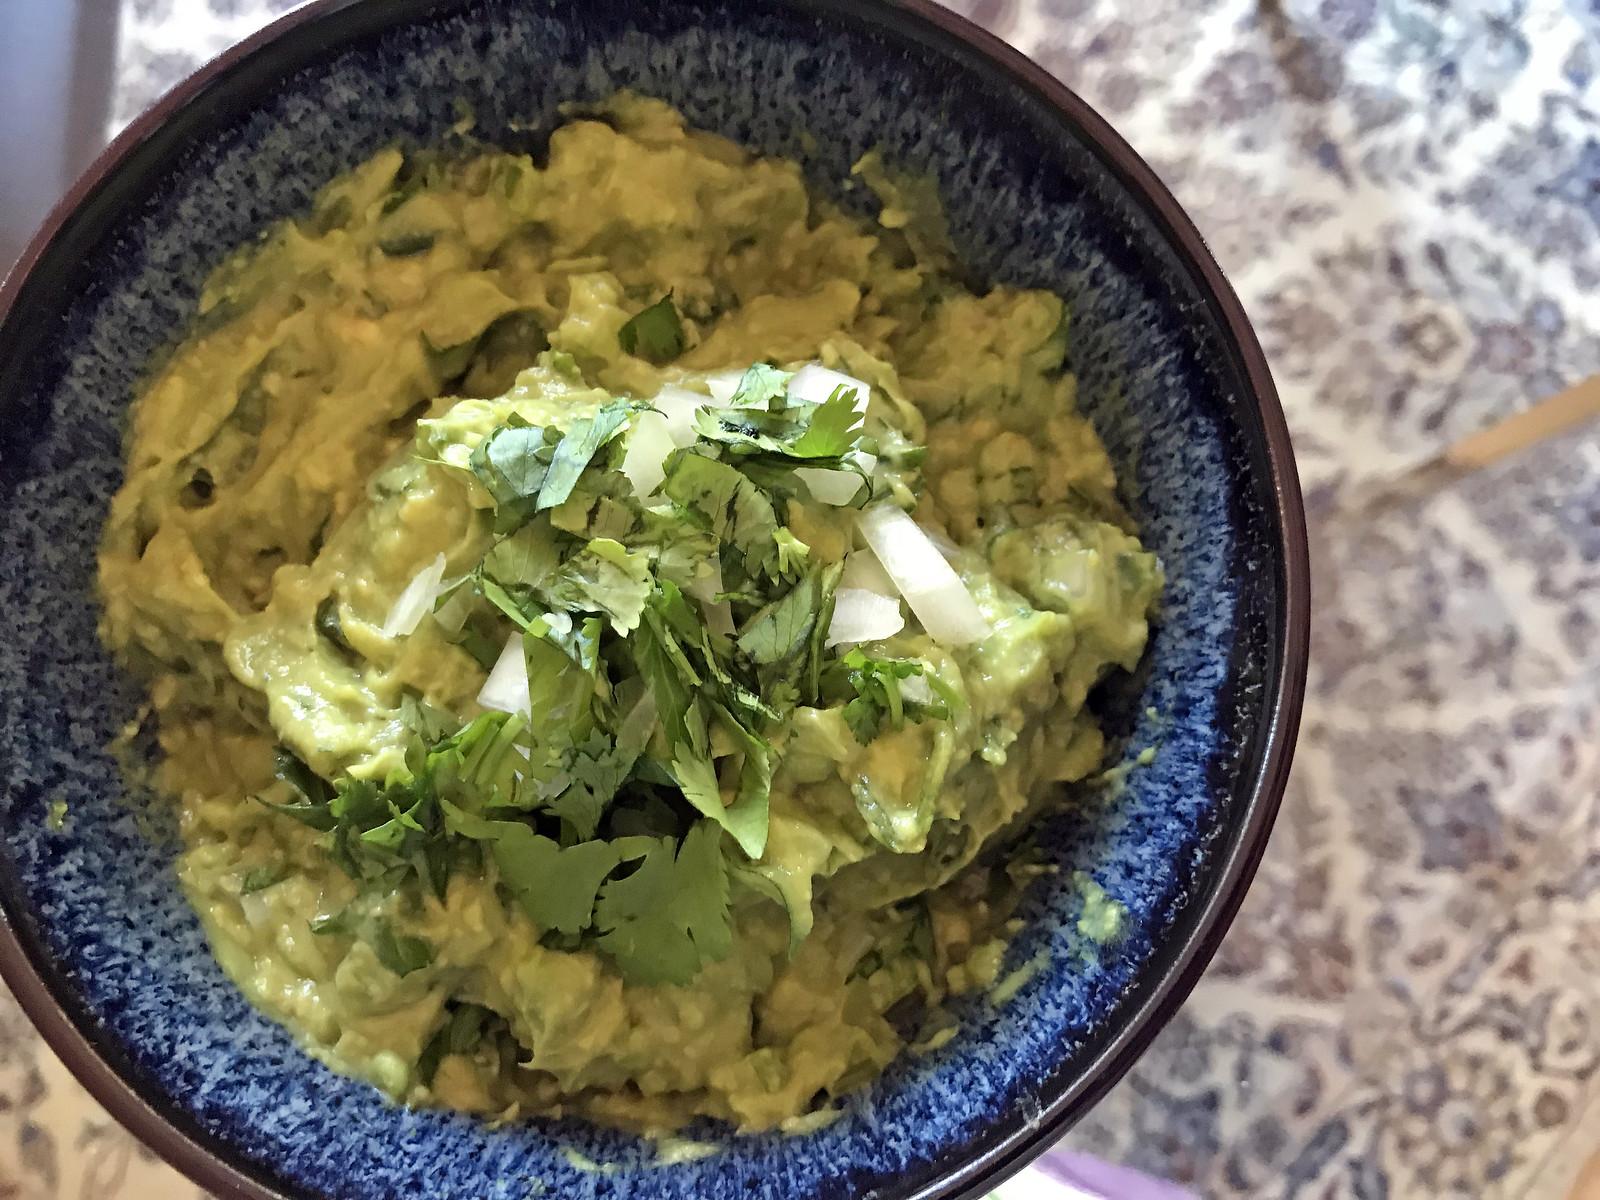 Celery-spiked guacamole